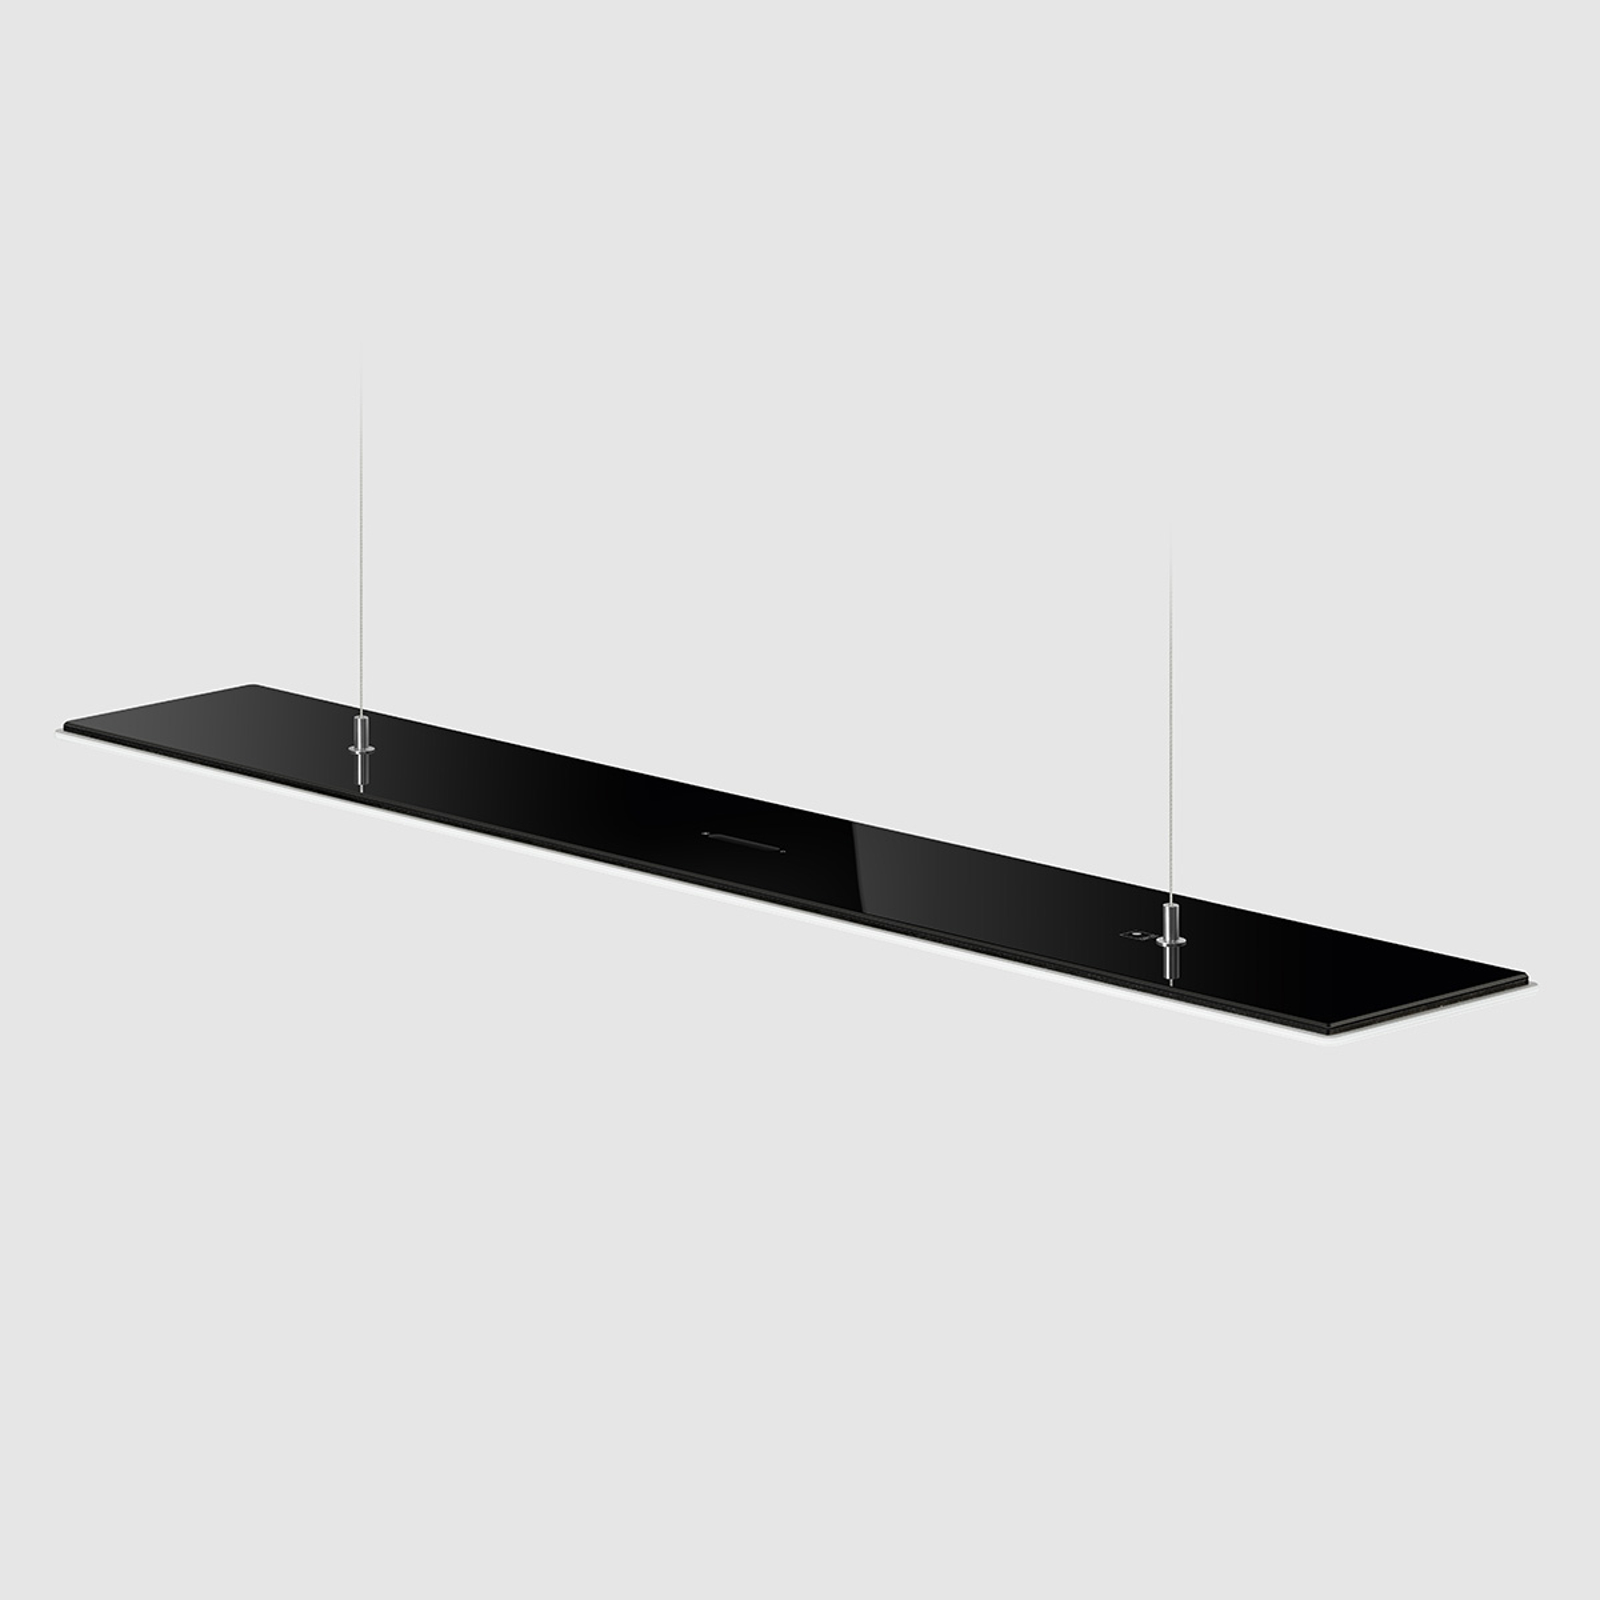 Acquista Lampada a sospensione OLED OMLED One s5L 96,5 cm